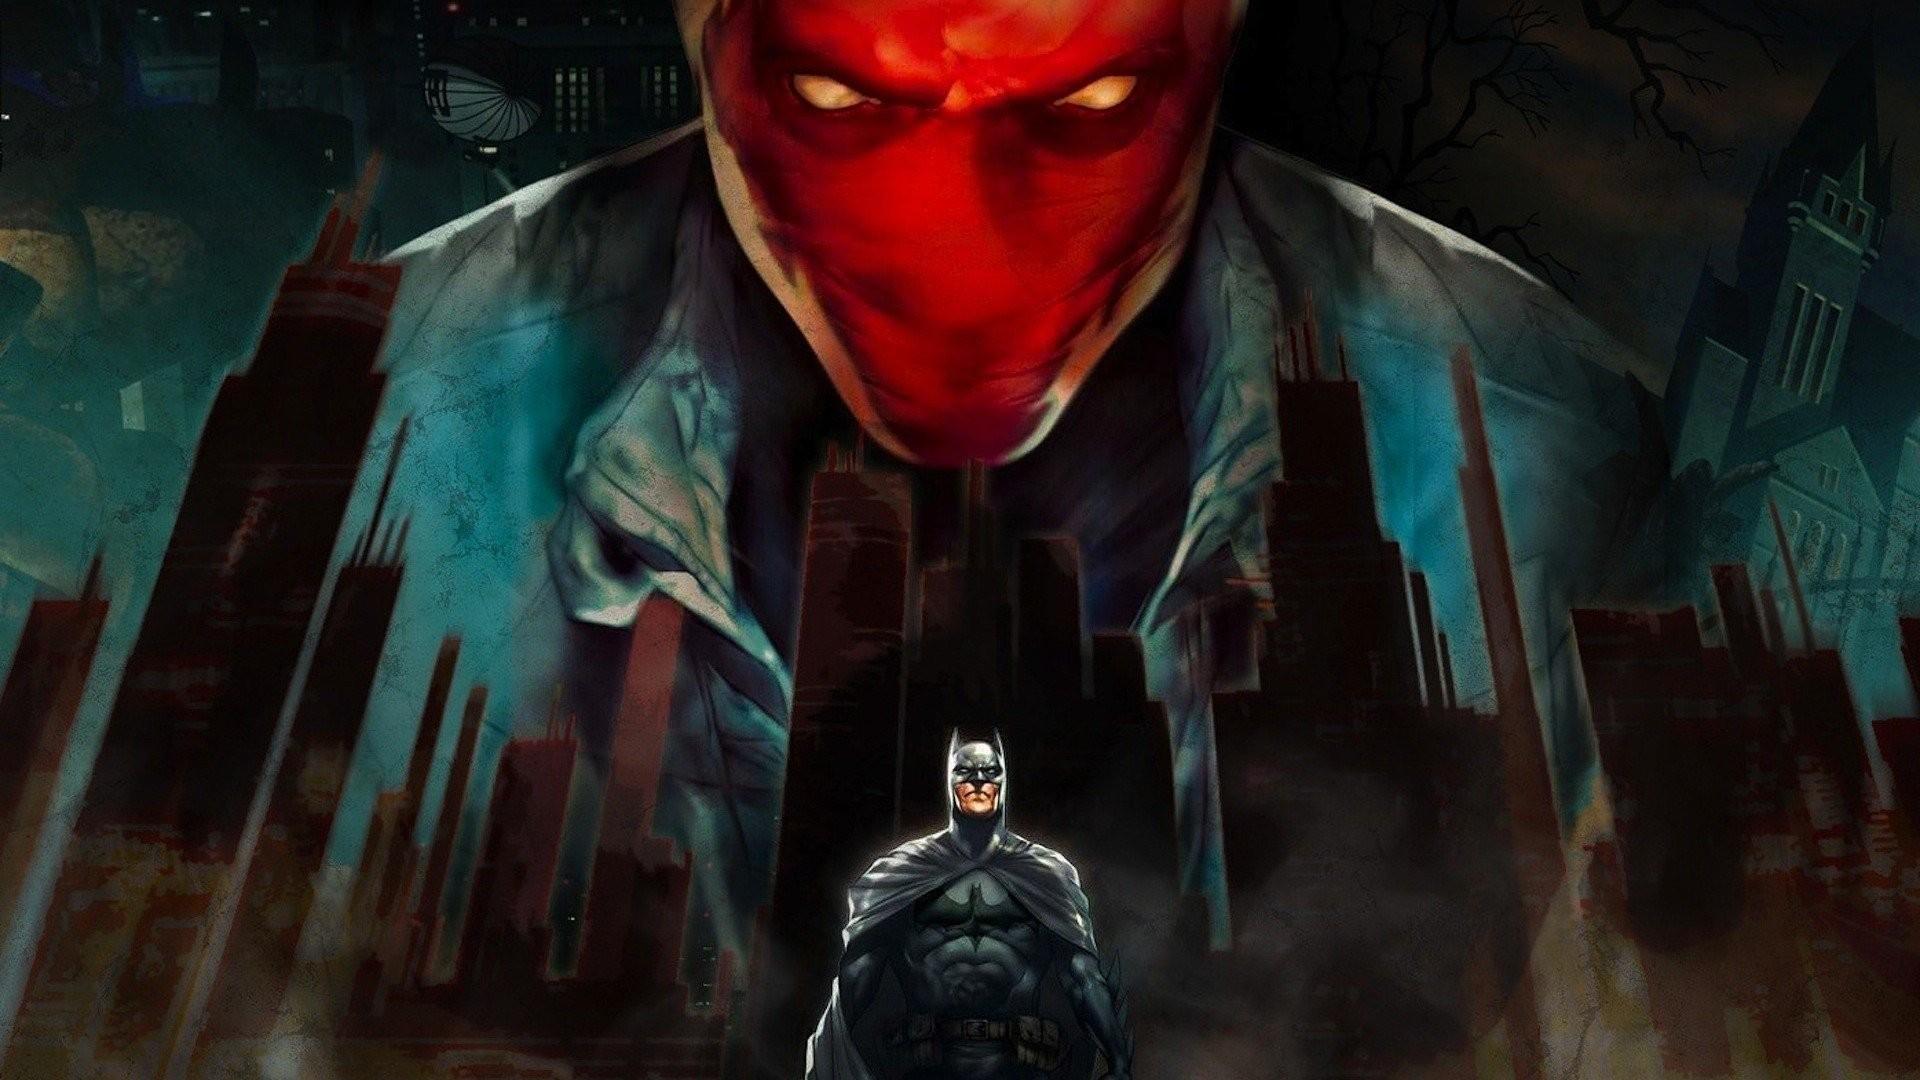 Batman Comics Red Hood Robin Superhero · HD Wallpaper | Background ID:216802